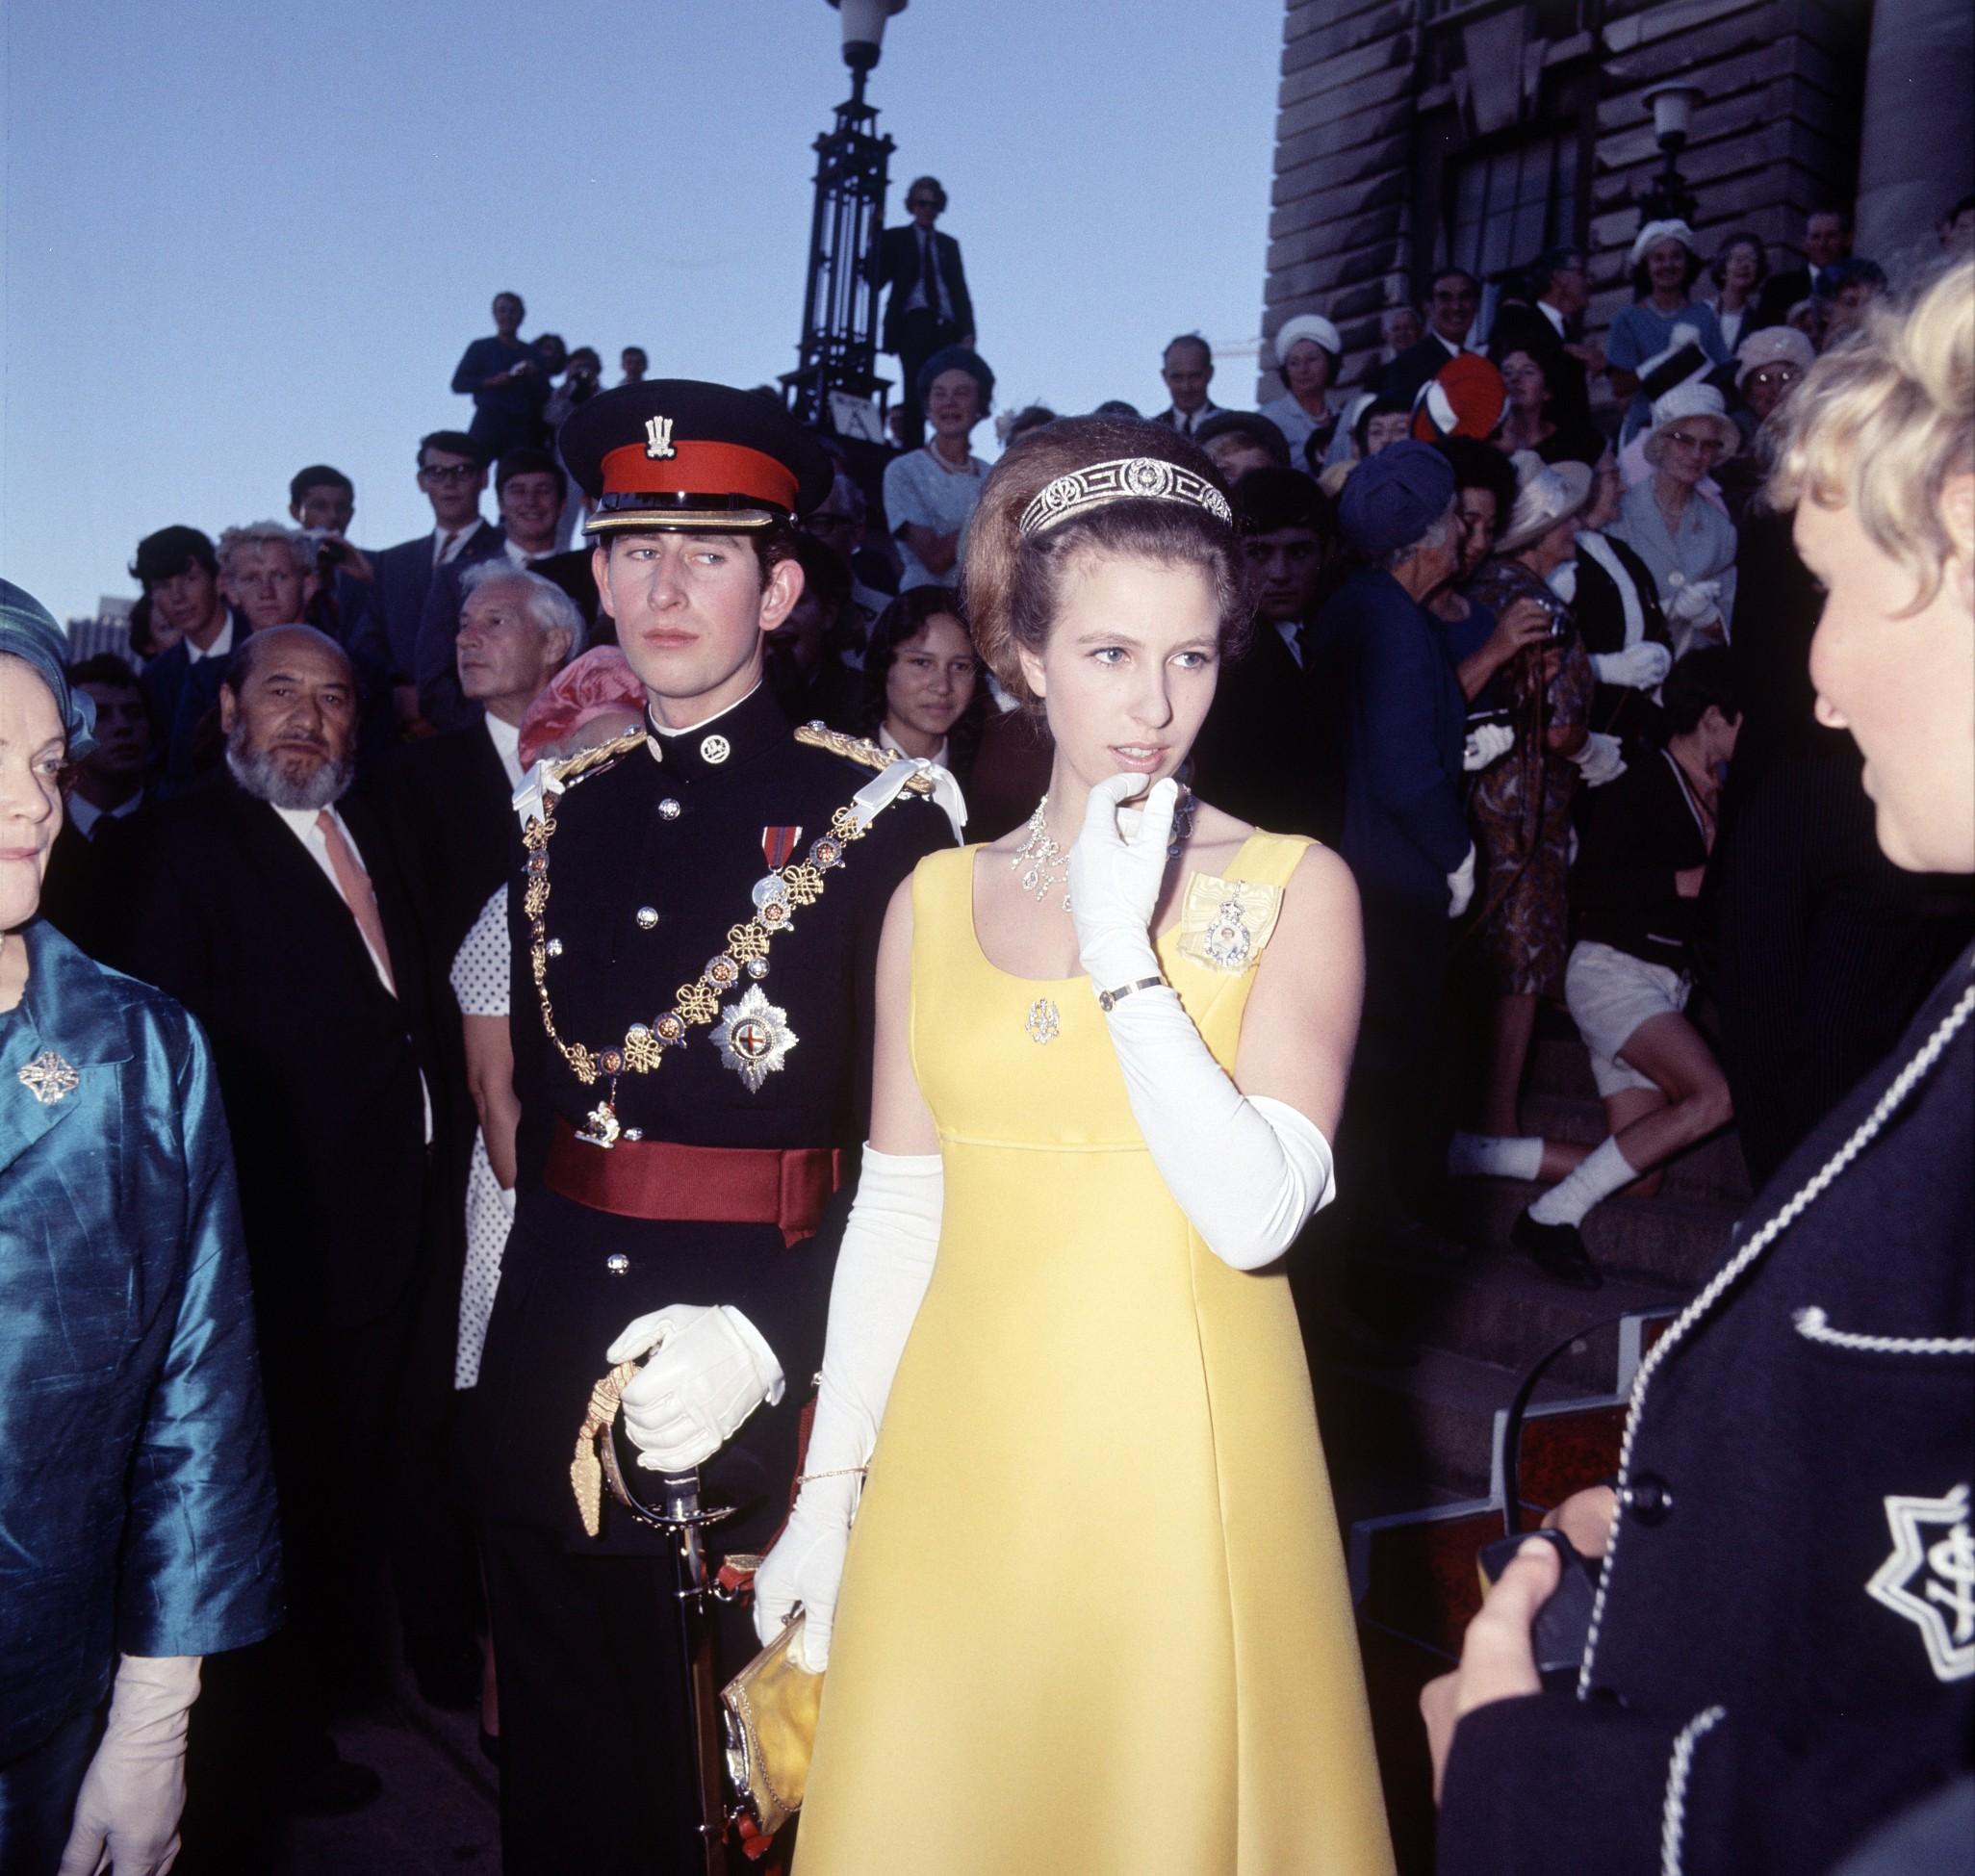 Prince Charles and Princess Anne, Wellington, New Zealand Princess Anne,Image: 229349221, License: Rights-managed, Restrictions: , Model Release: no, Credit line: Reginald Davis / Shutterstock Editorial / Profimedia